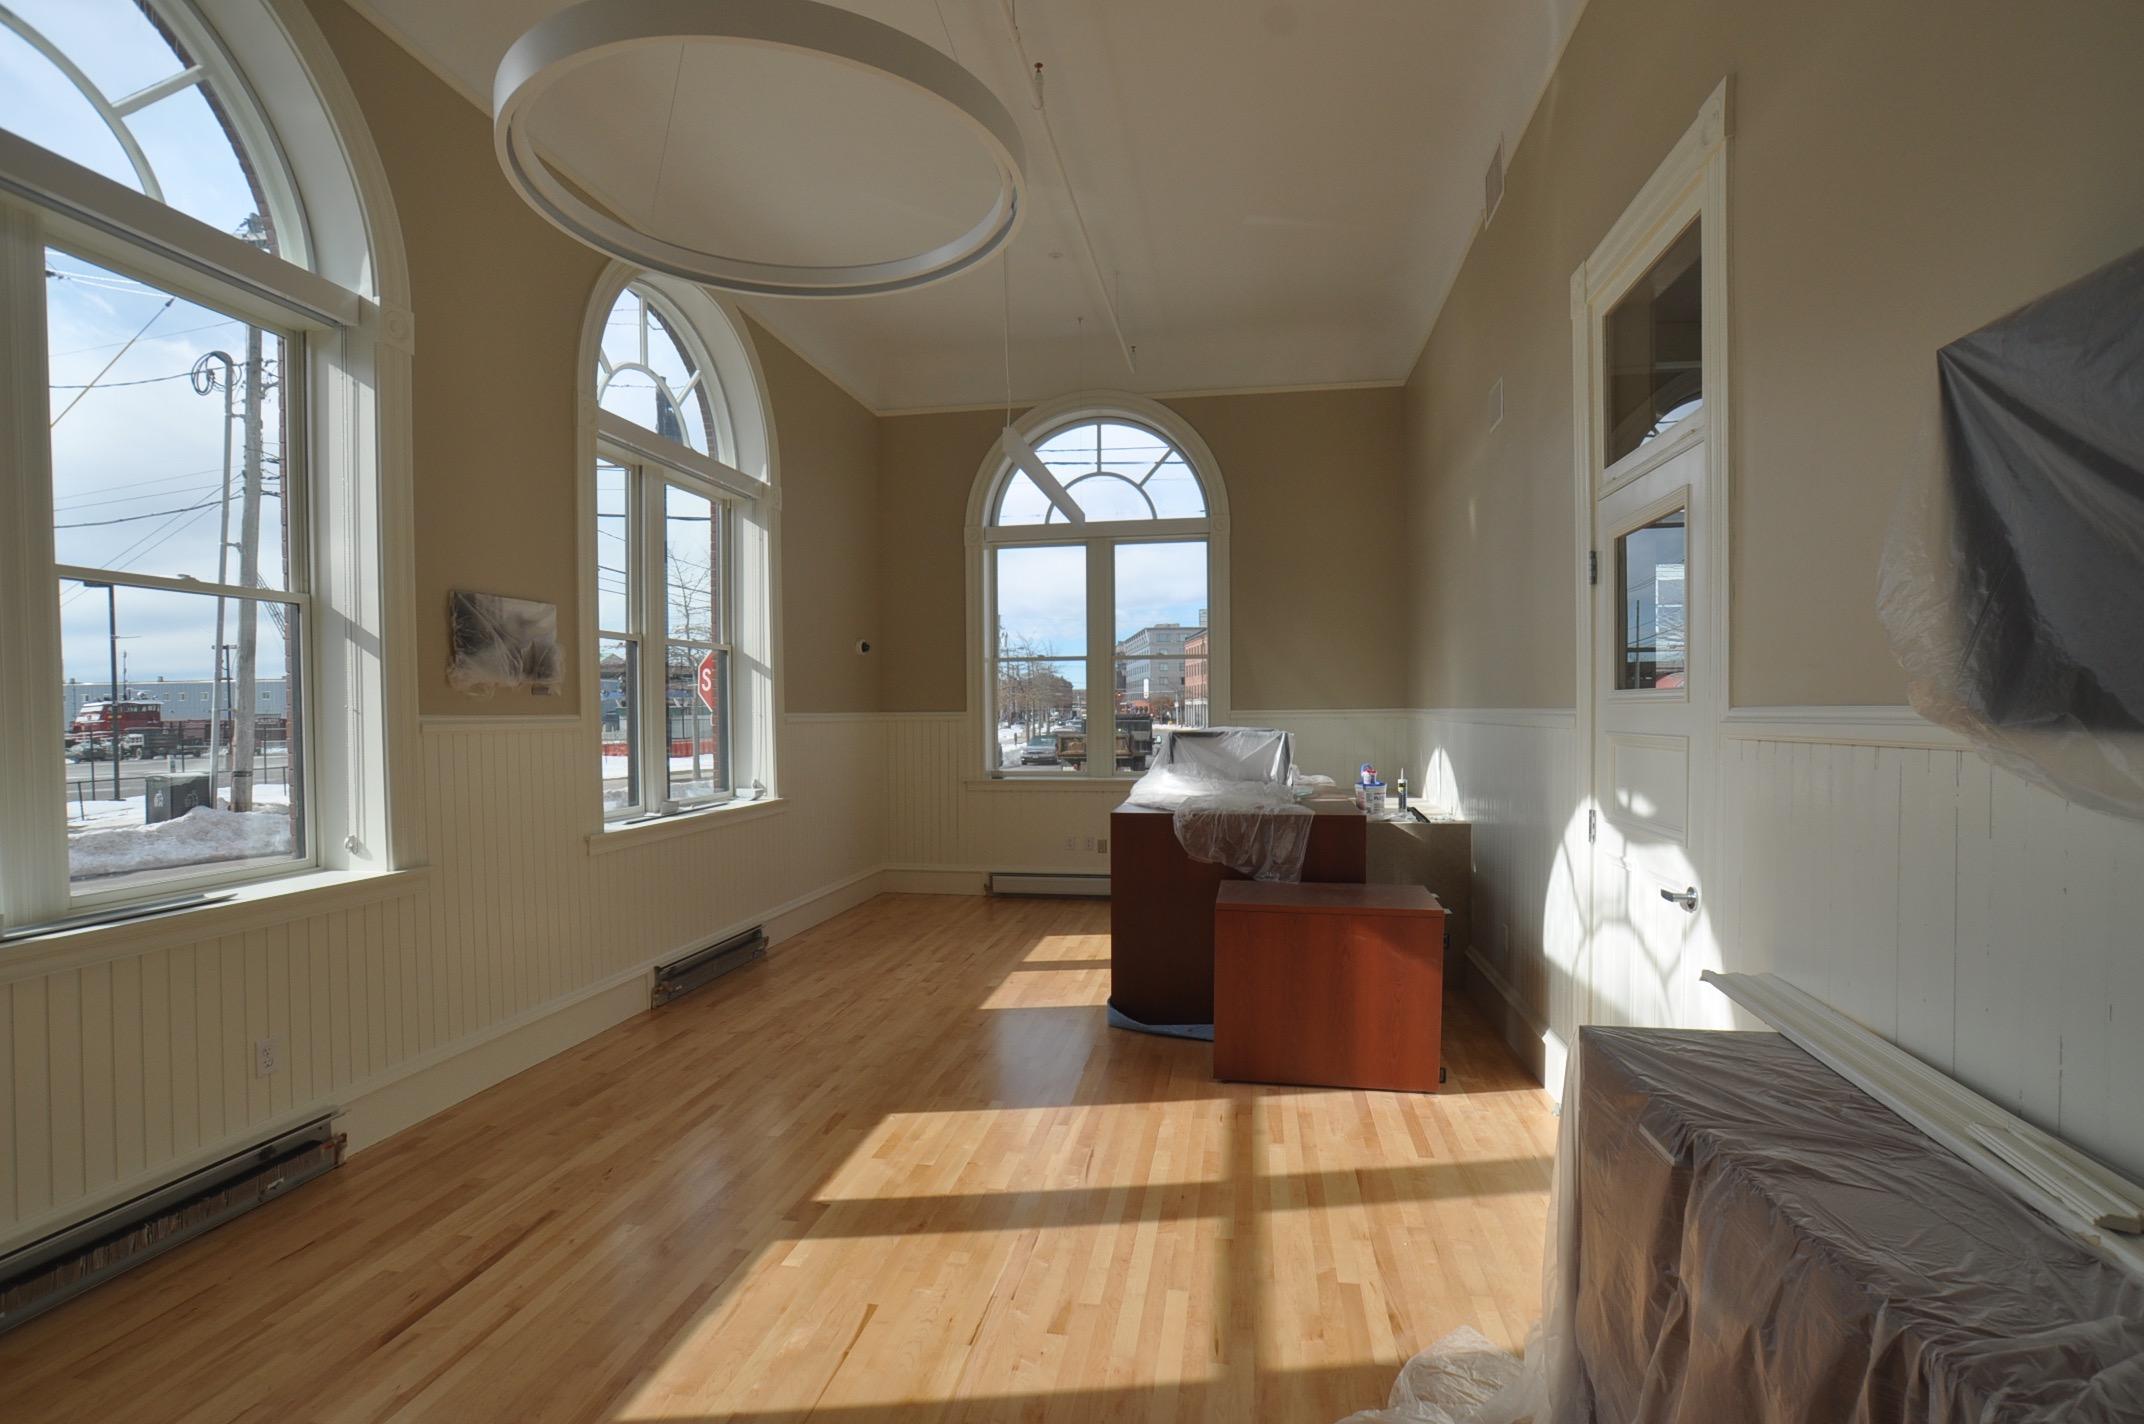 Photo 38 after -interior office- grand trunk-DSC_0043.jpg